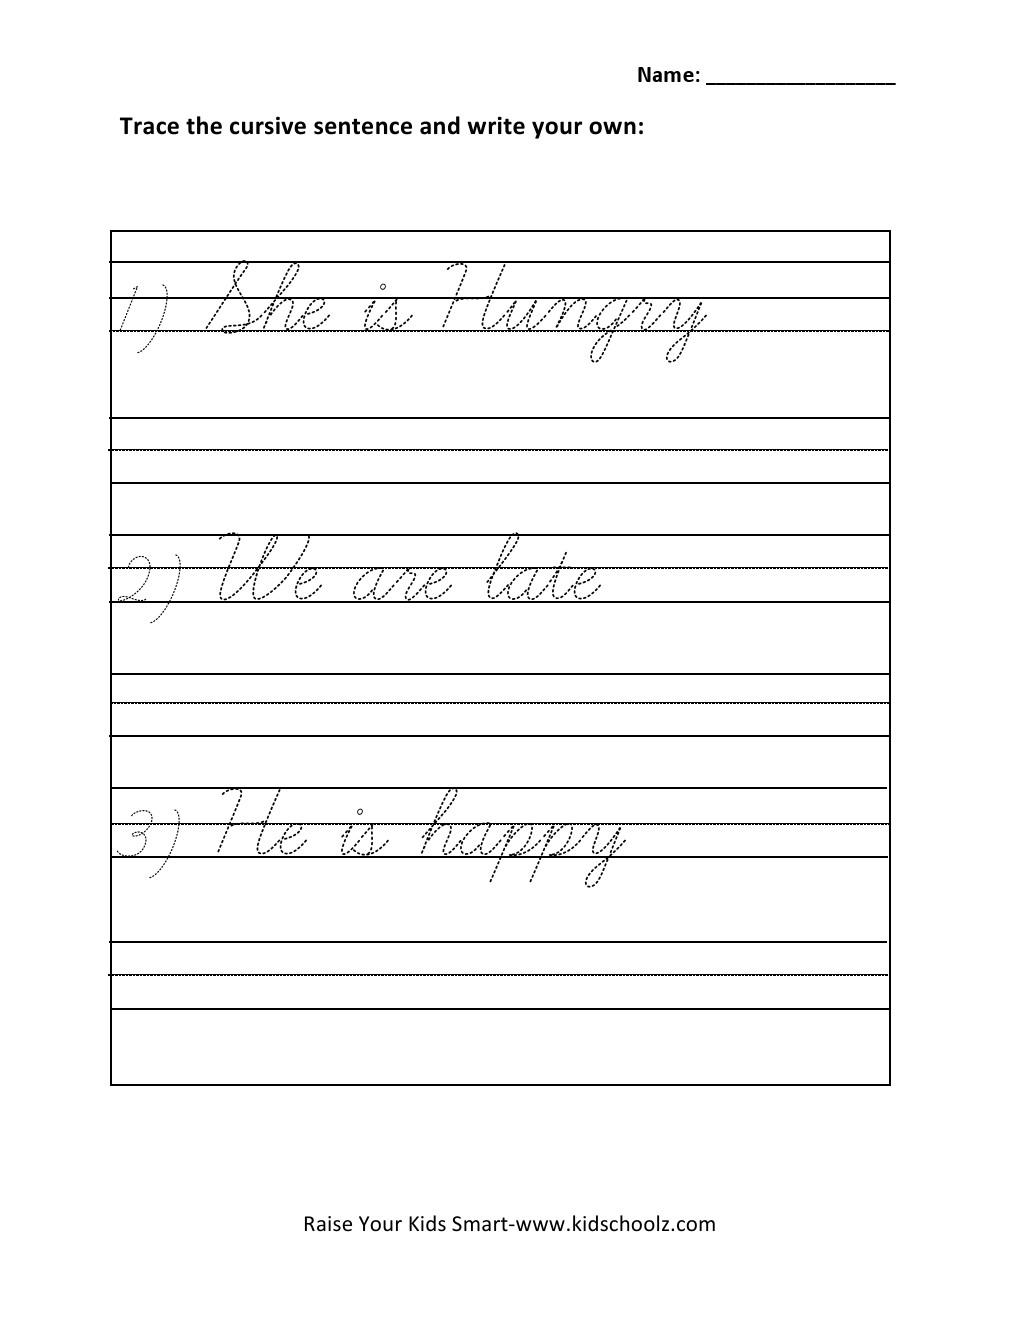 Cursive Handwriting Worksheets Sentences Worksheets For All